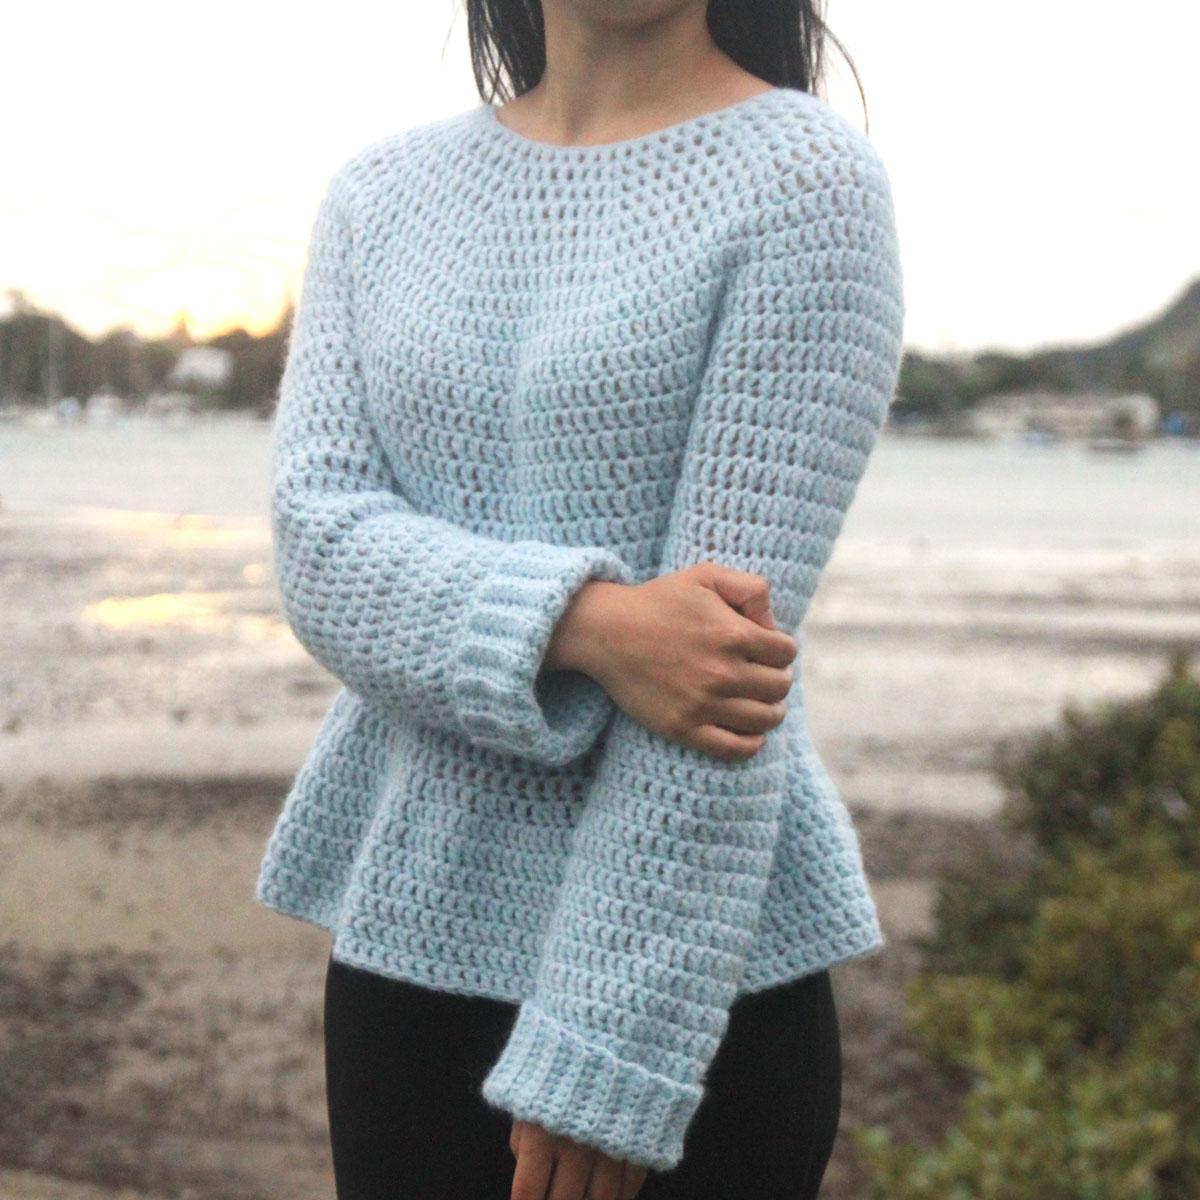 Cat sweater | Etsy | 1200x1200